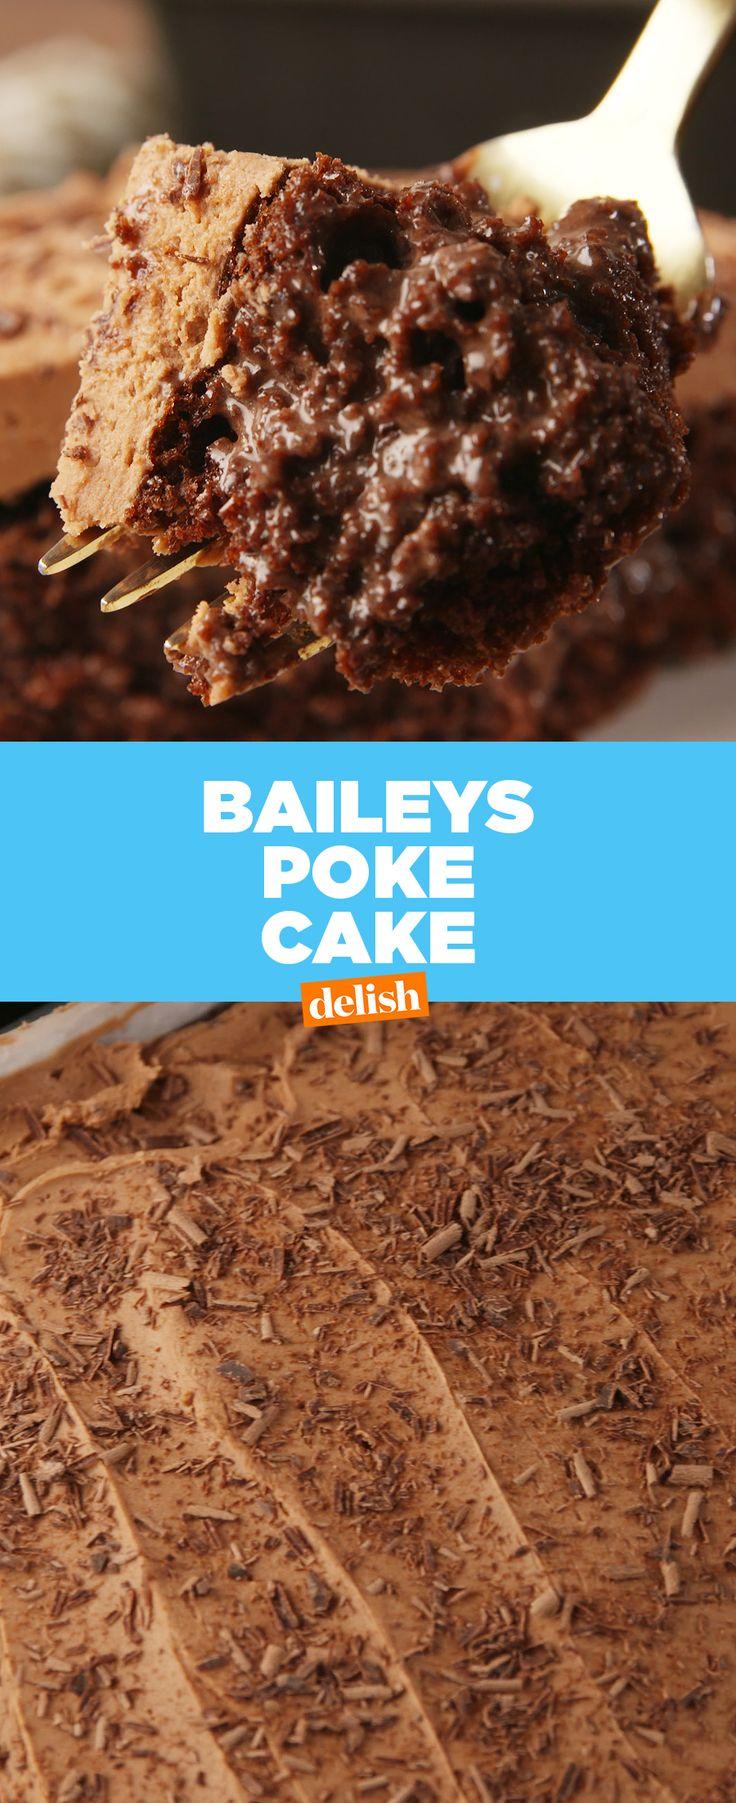 Baileys fans: this boozy poke cake is a dream come true. Get the recipe at Delish.com. #baileys #irishcream #alcohol #liquer #chocolate #poke #pokecake #cake #baking #dessert #recipe #easyrecipe #delish